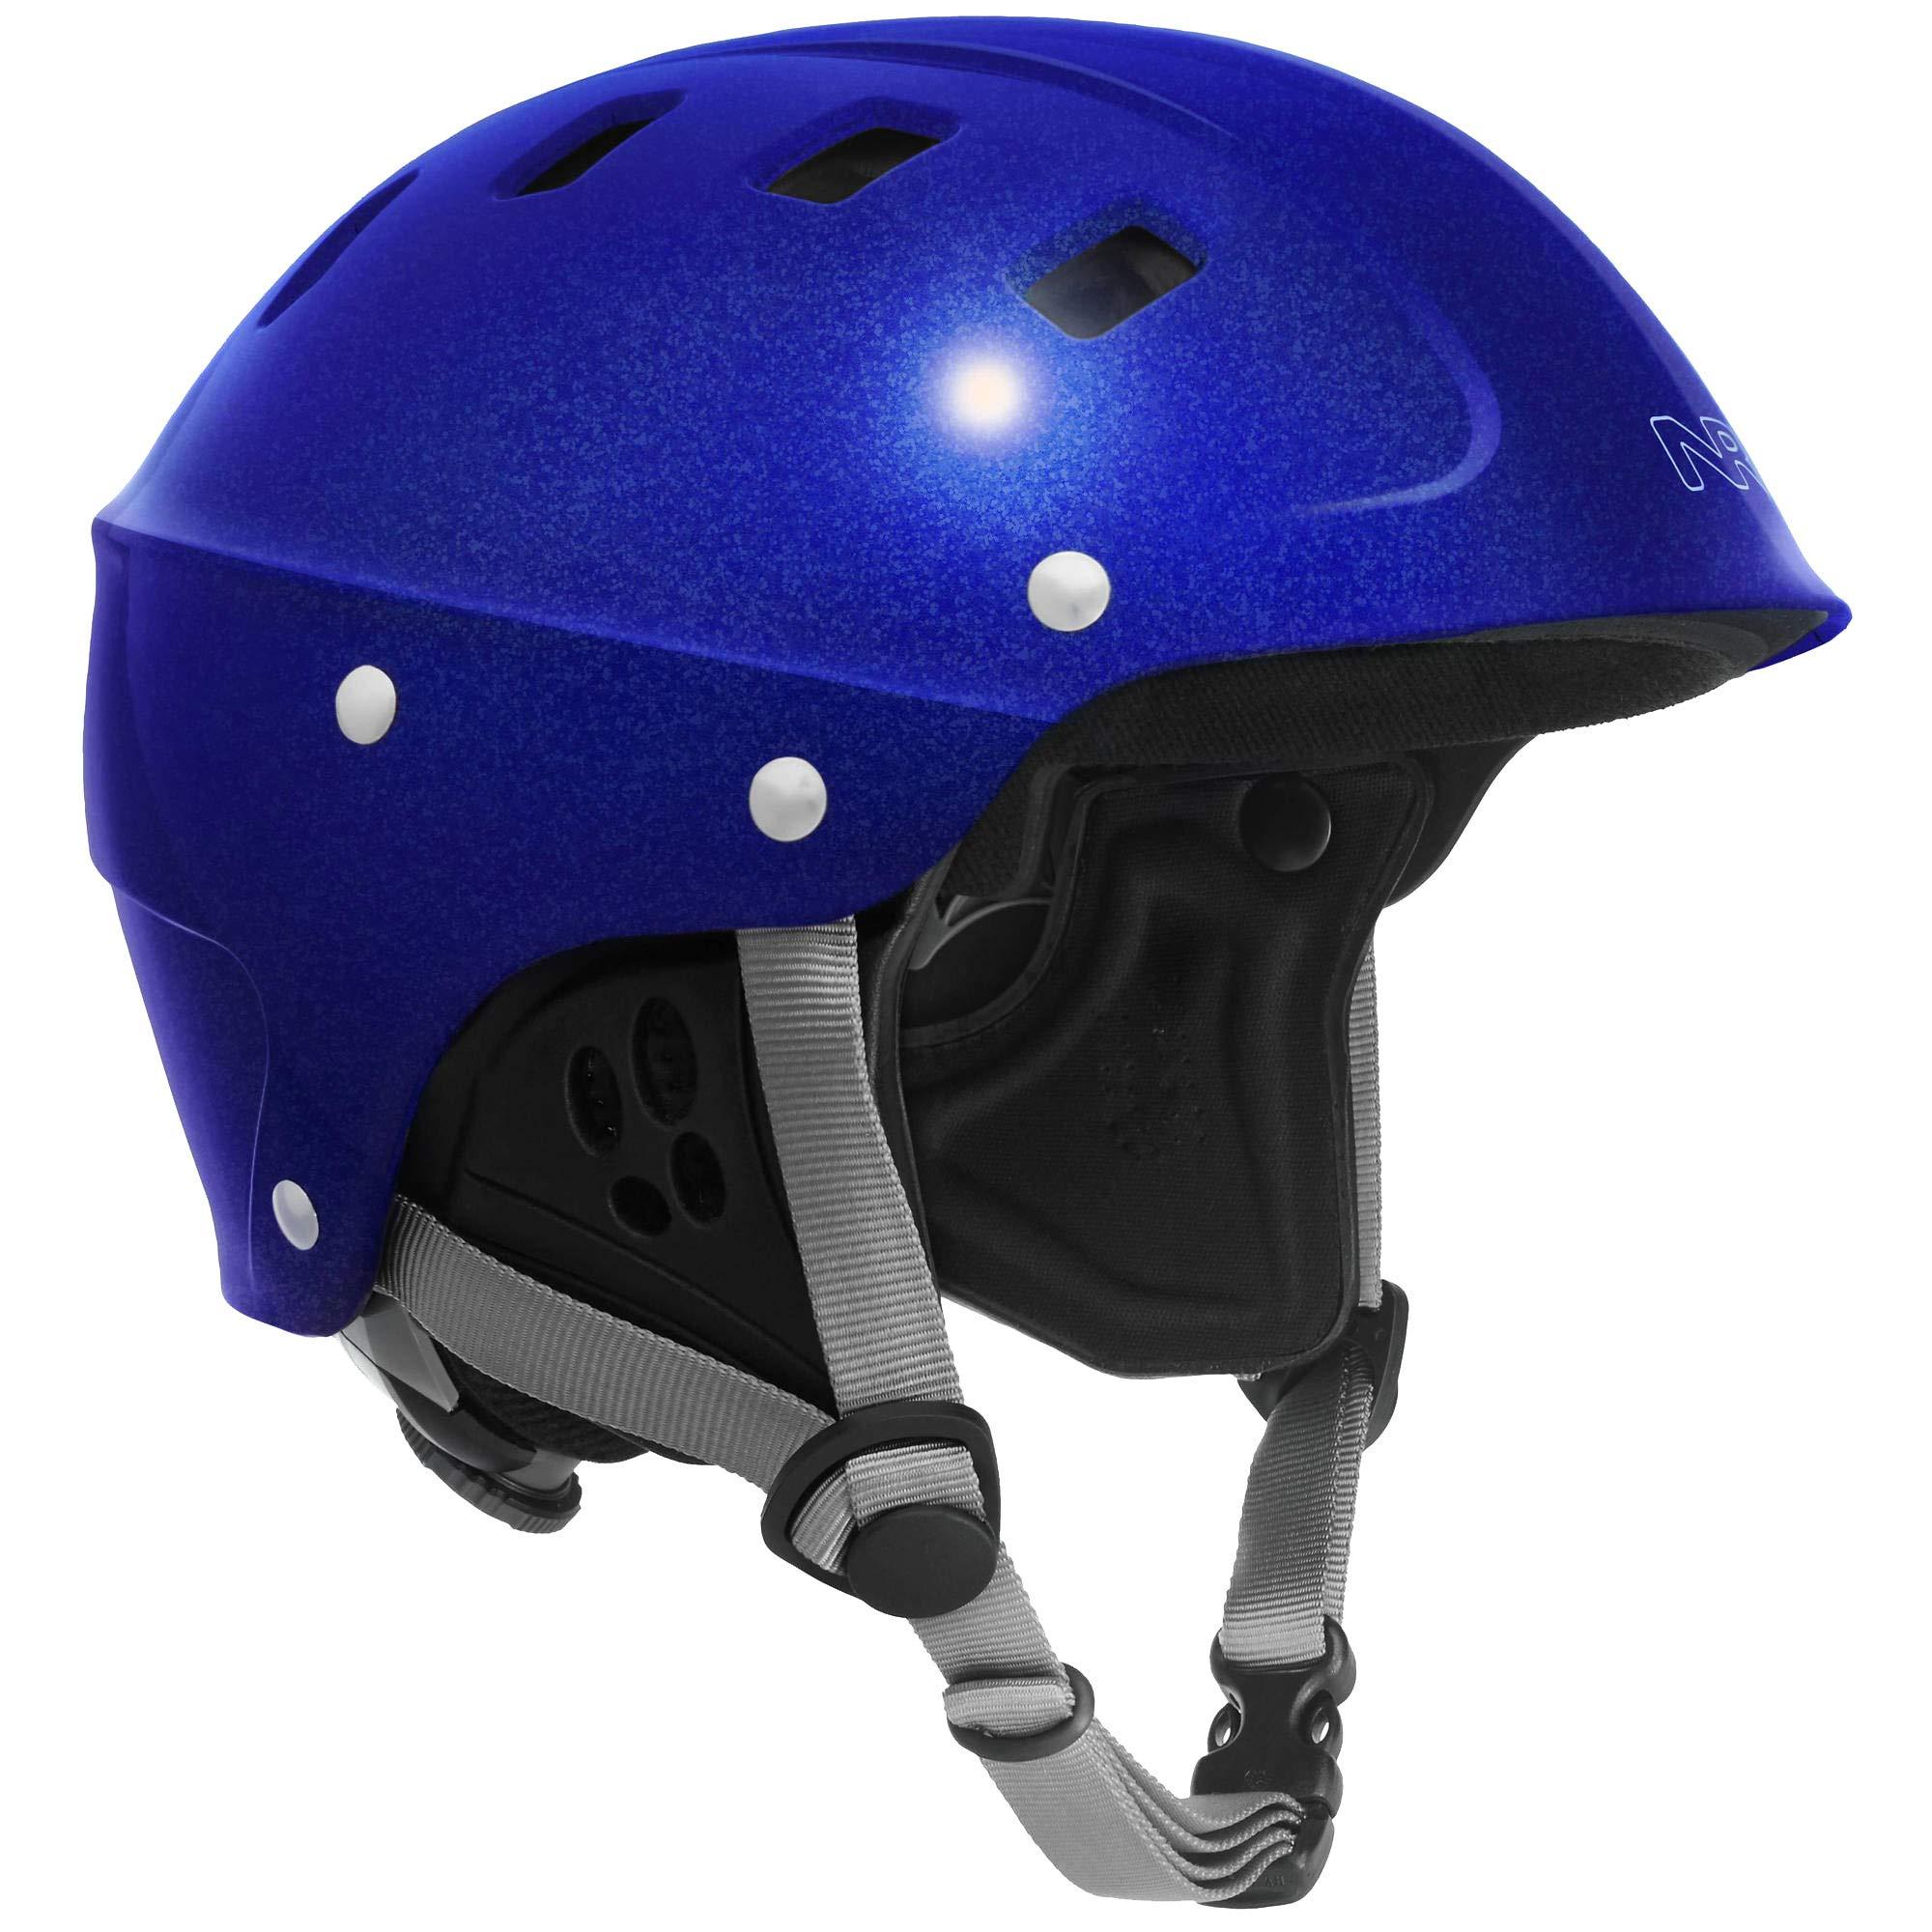 NRS Chaos Side Cut Helmet Blue XL by NRS